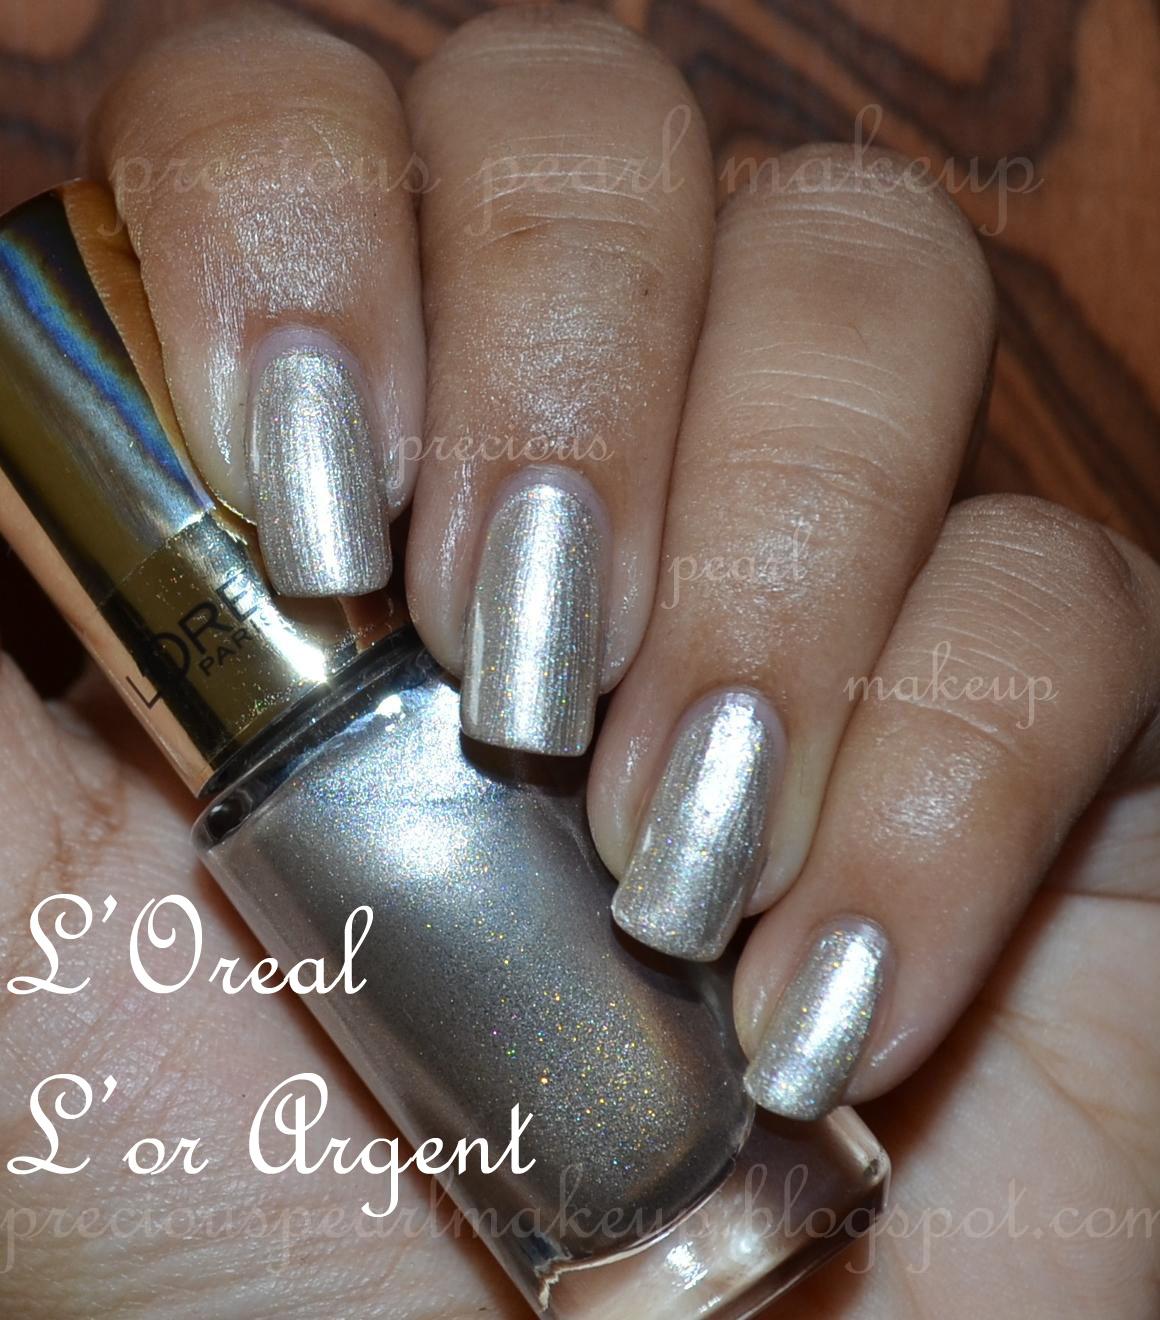 preciouspearlmakeup: L\'Oreal Color Riche Nail Lacquer L\'or Argent